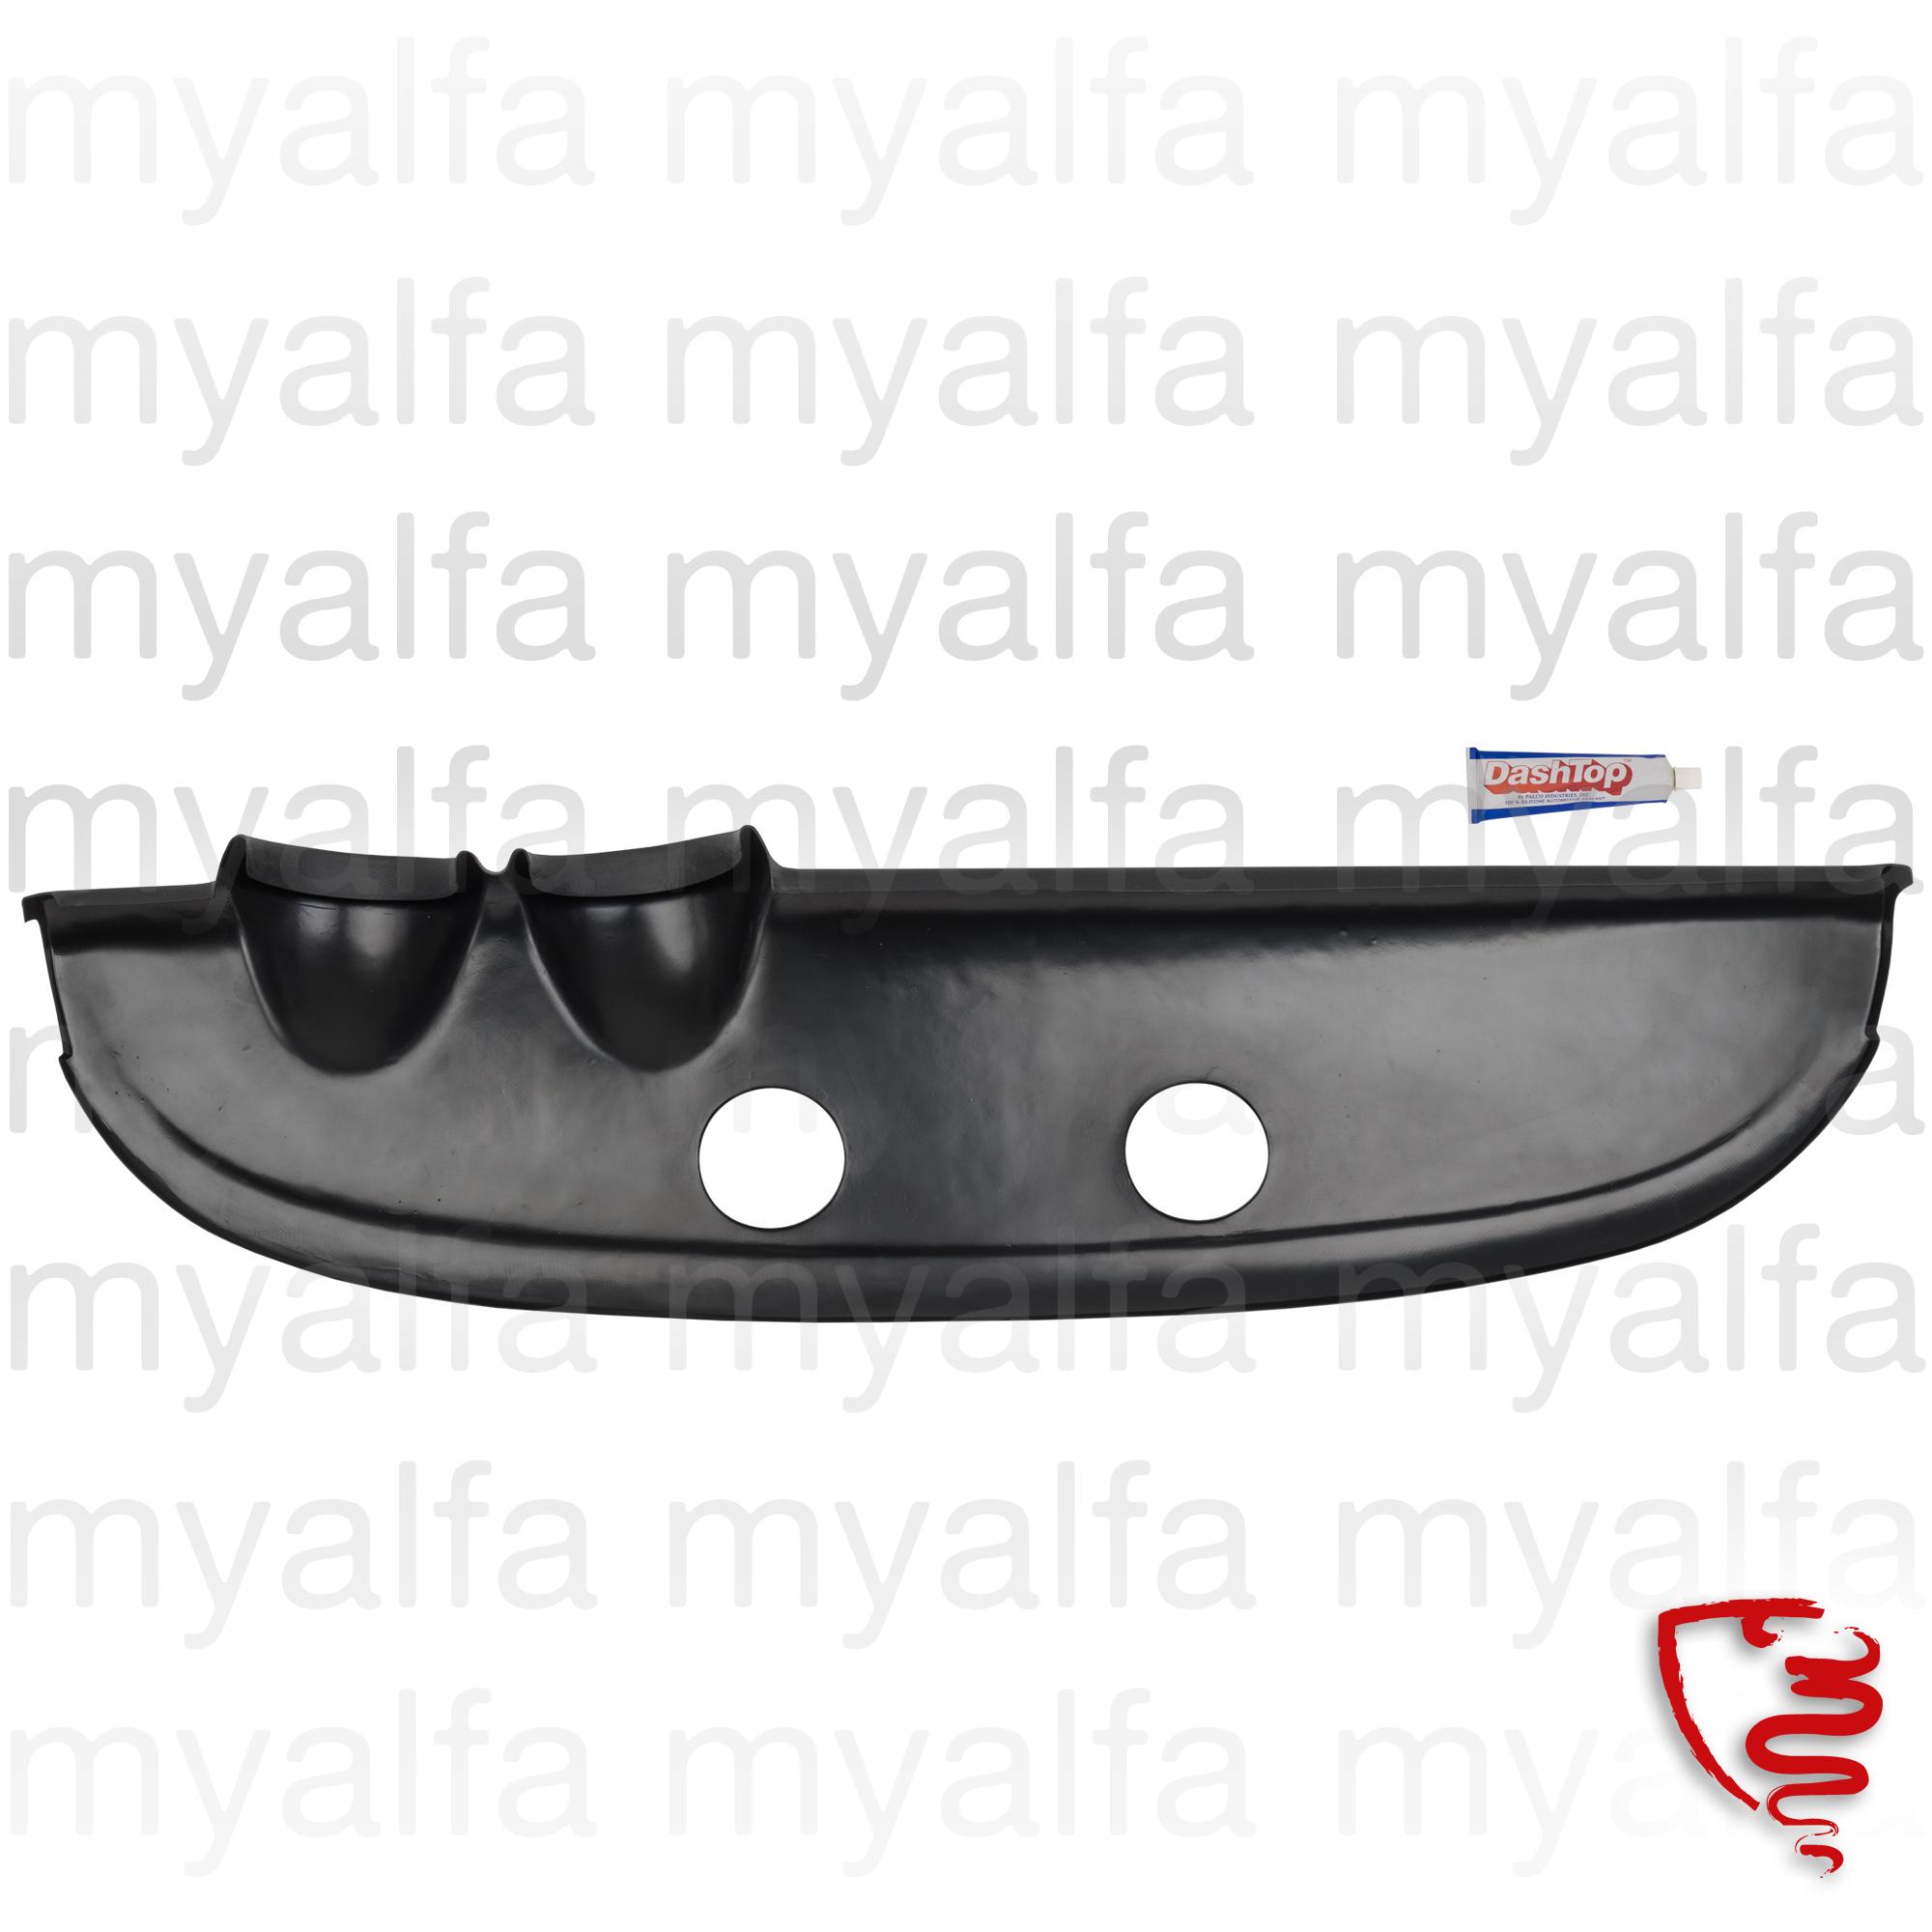 Kit repair dashboard 1300-1750 GT for 105/115, Coupe, 1750, Giulia Sprint GT, GTC, Junior, Interior, Dashboard, Dashbords